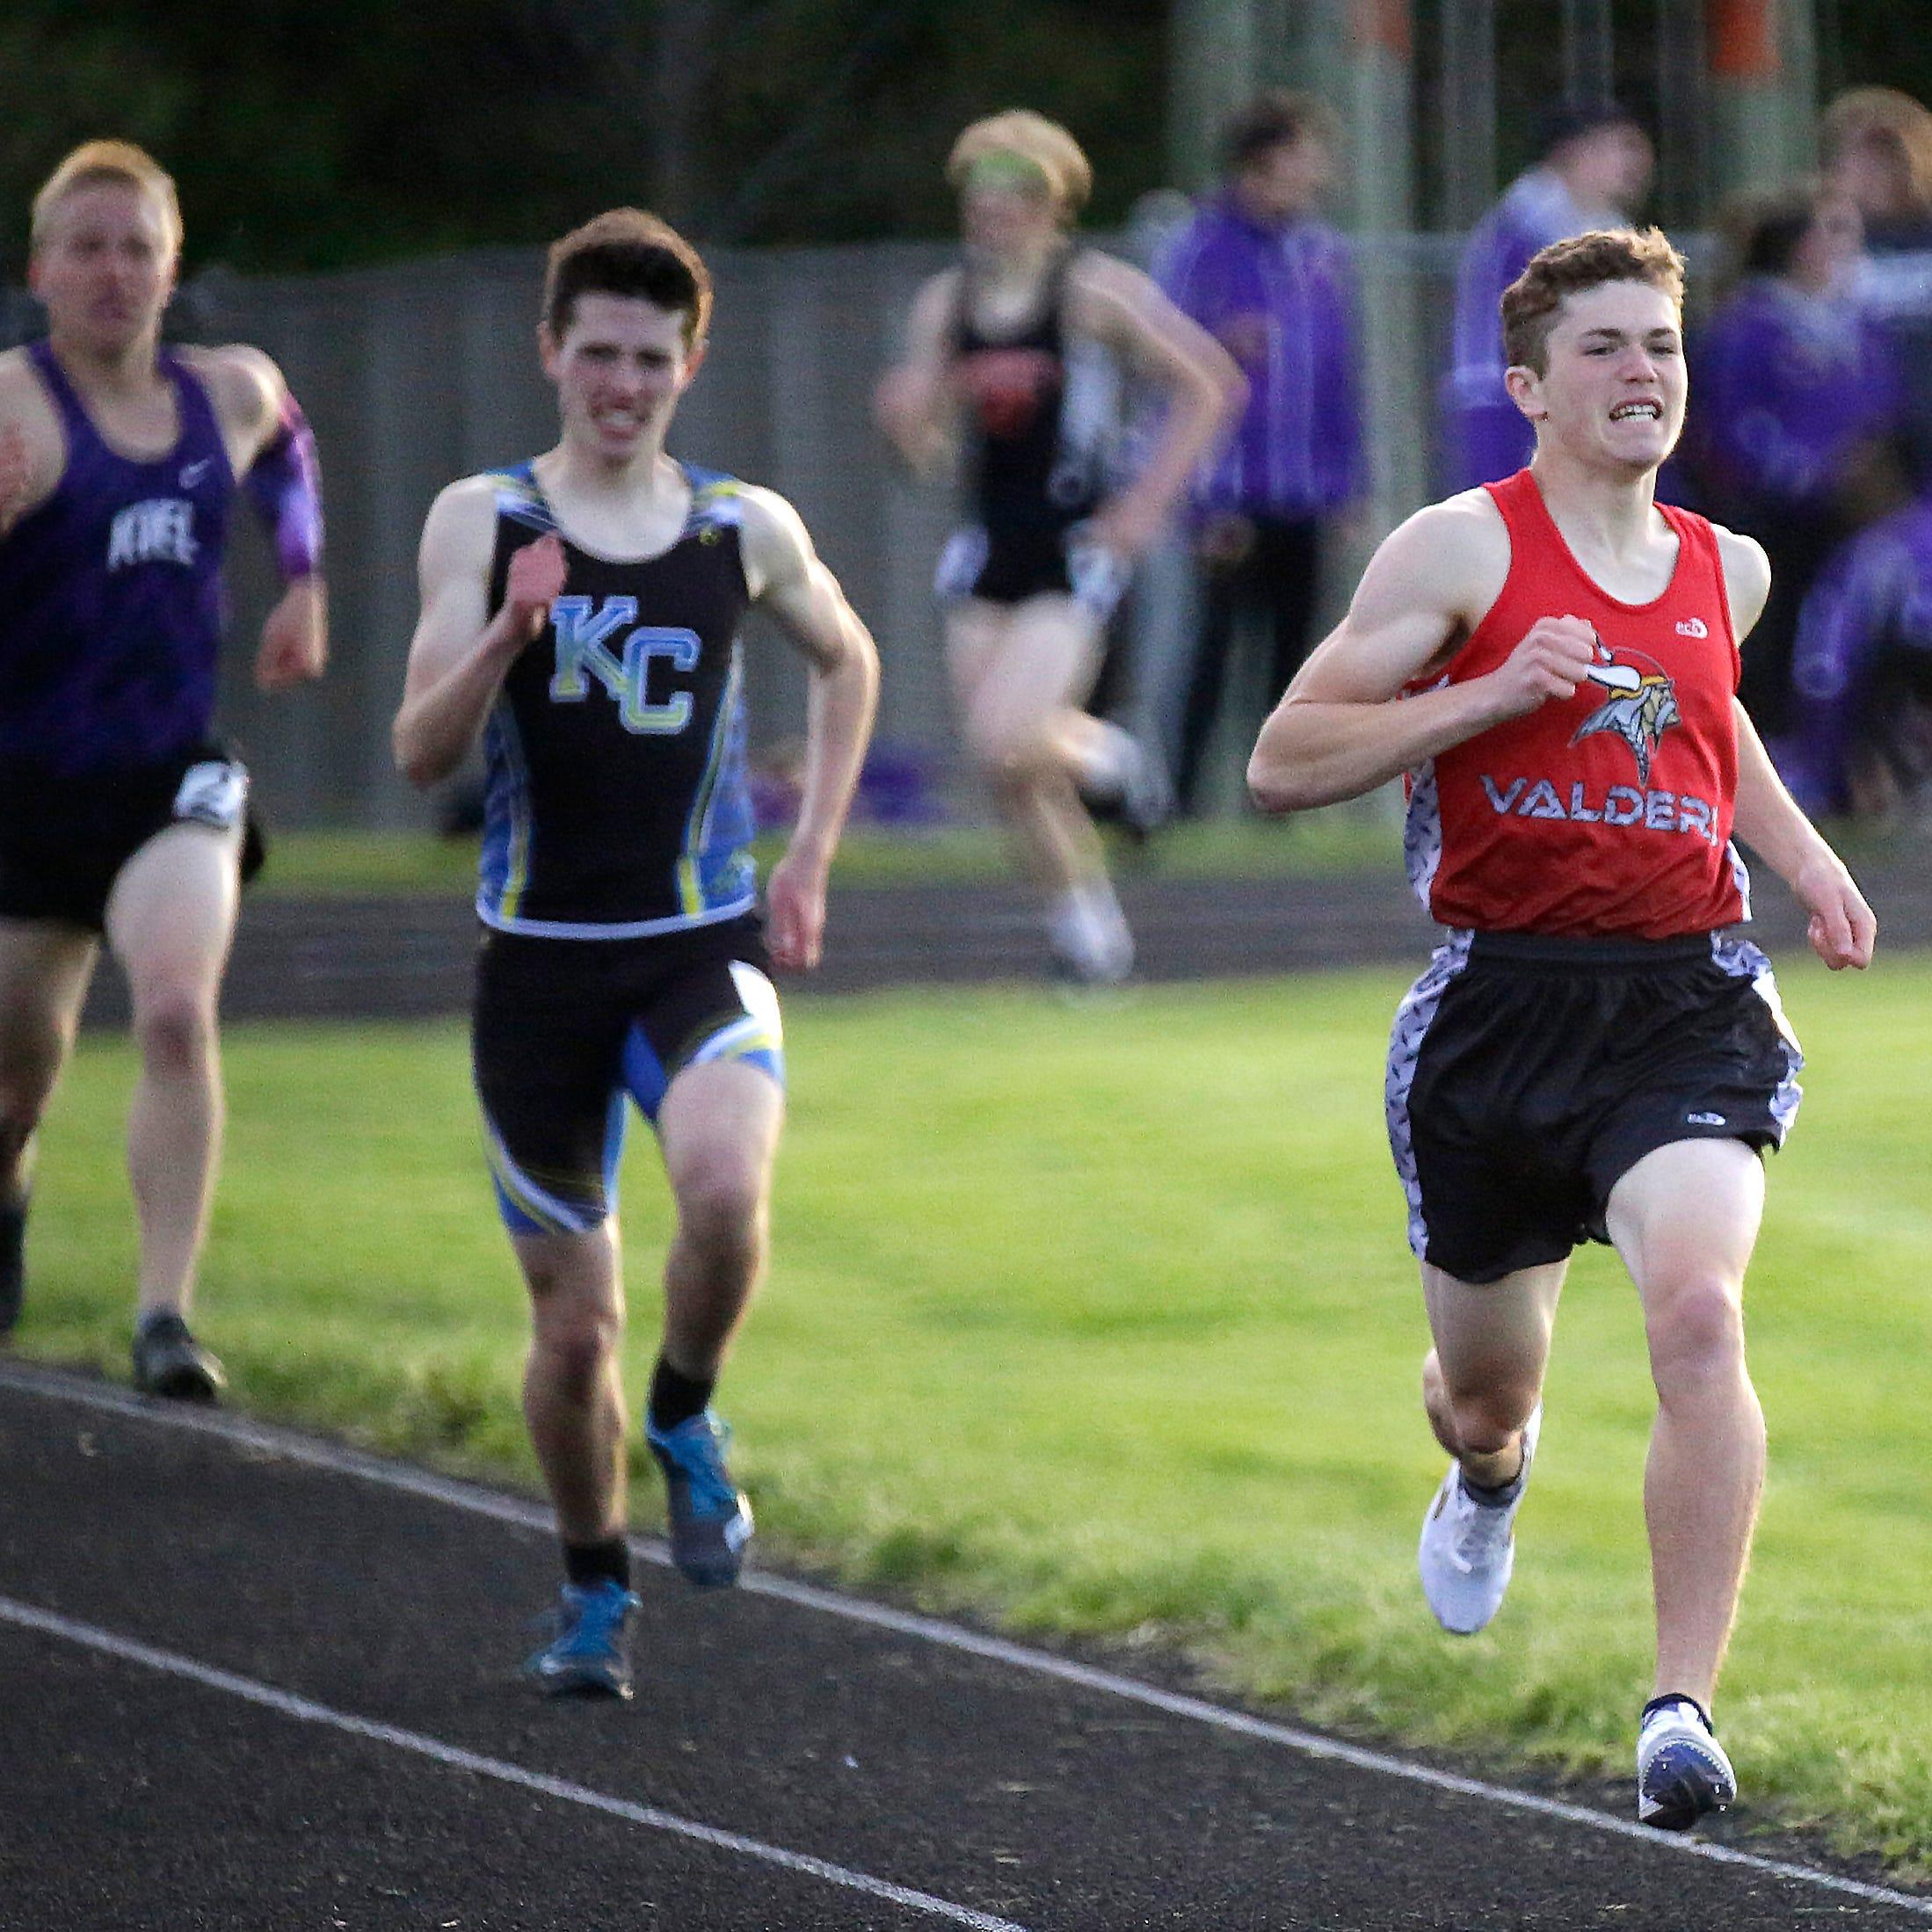 High school: Monday's track regionals